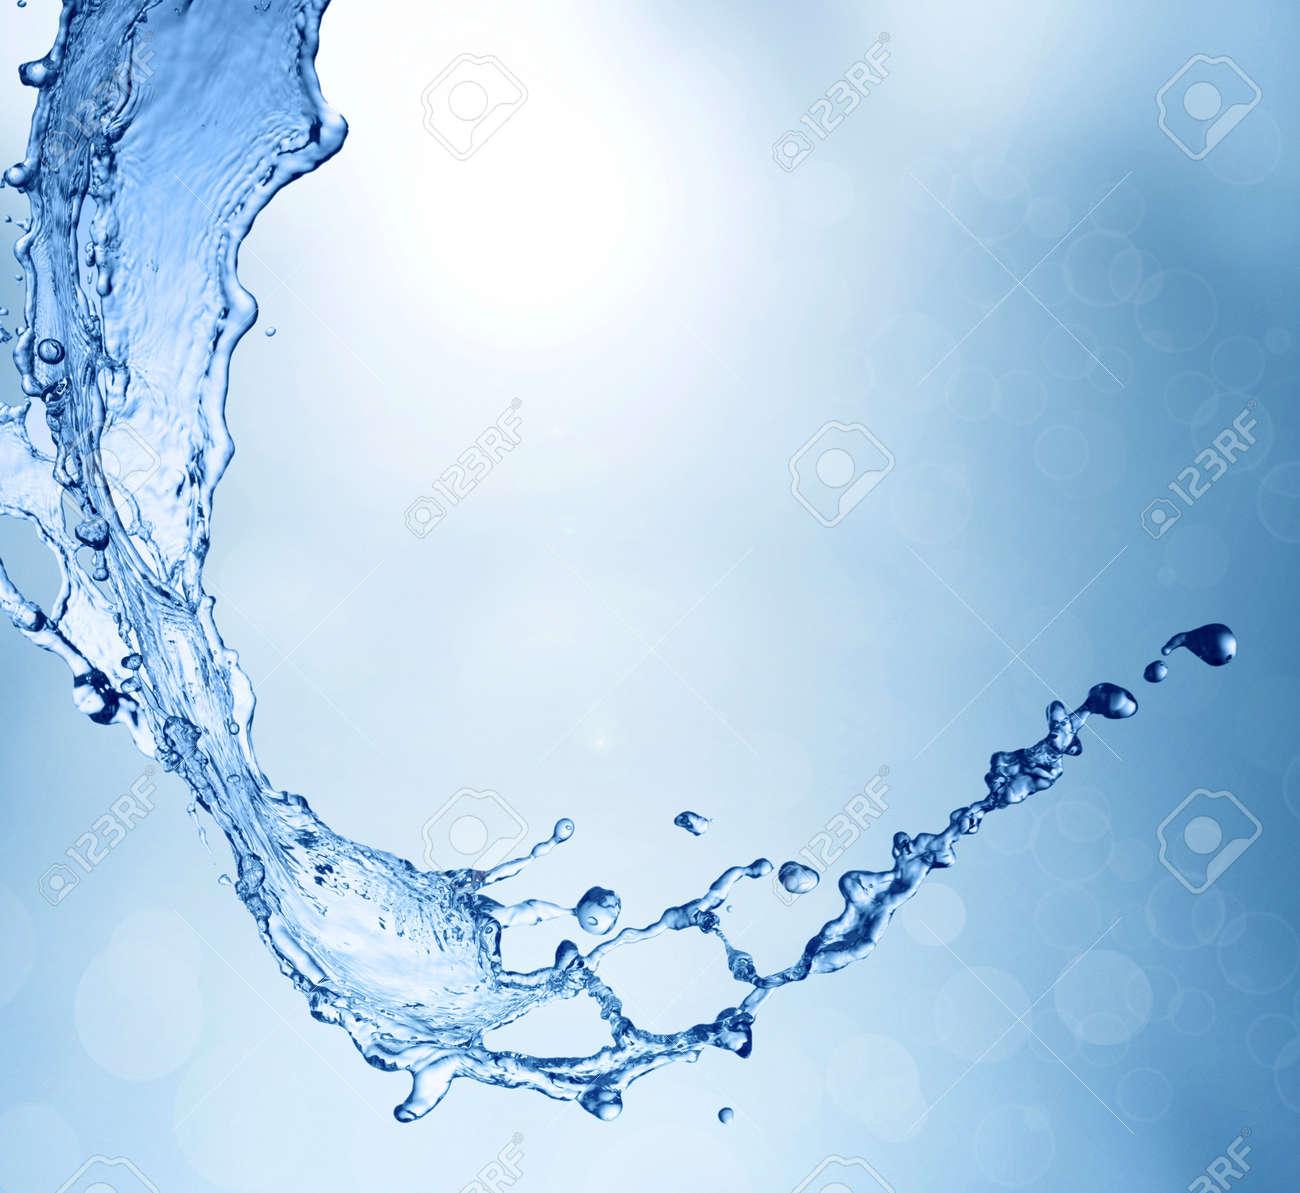 Spring fresh water background Stock Photo - 11247498